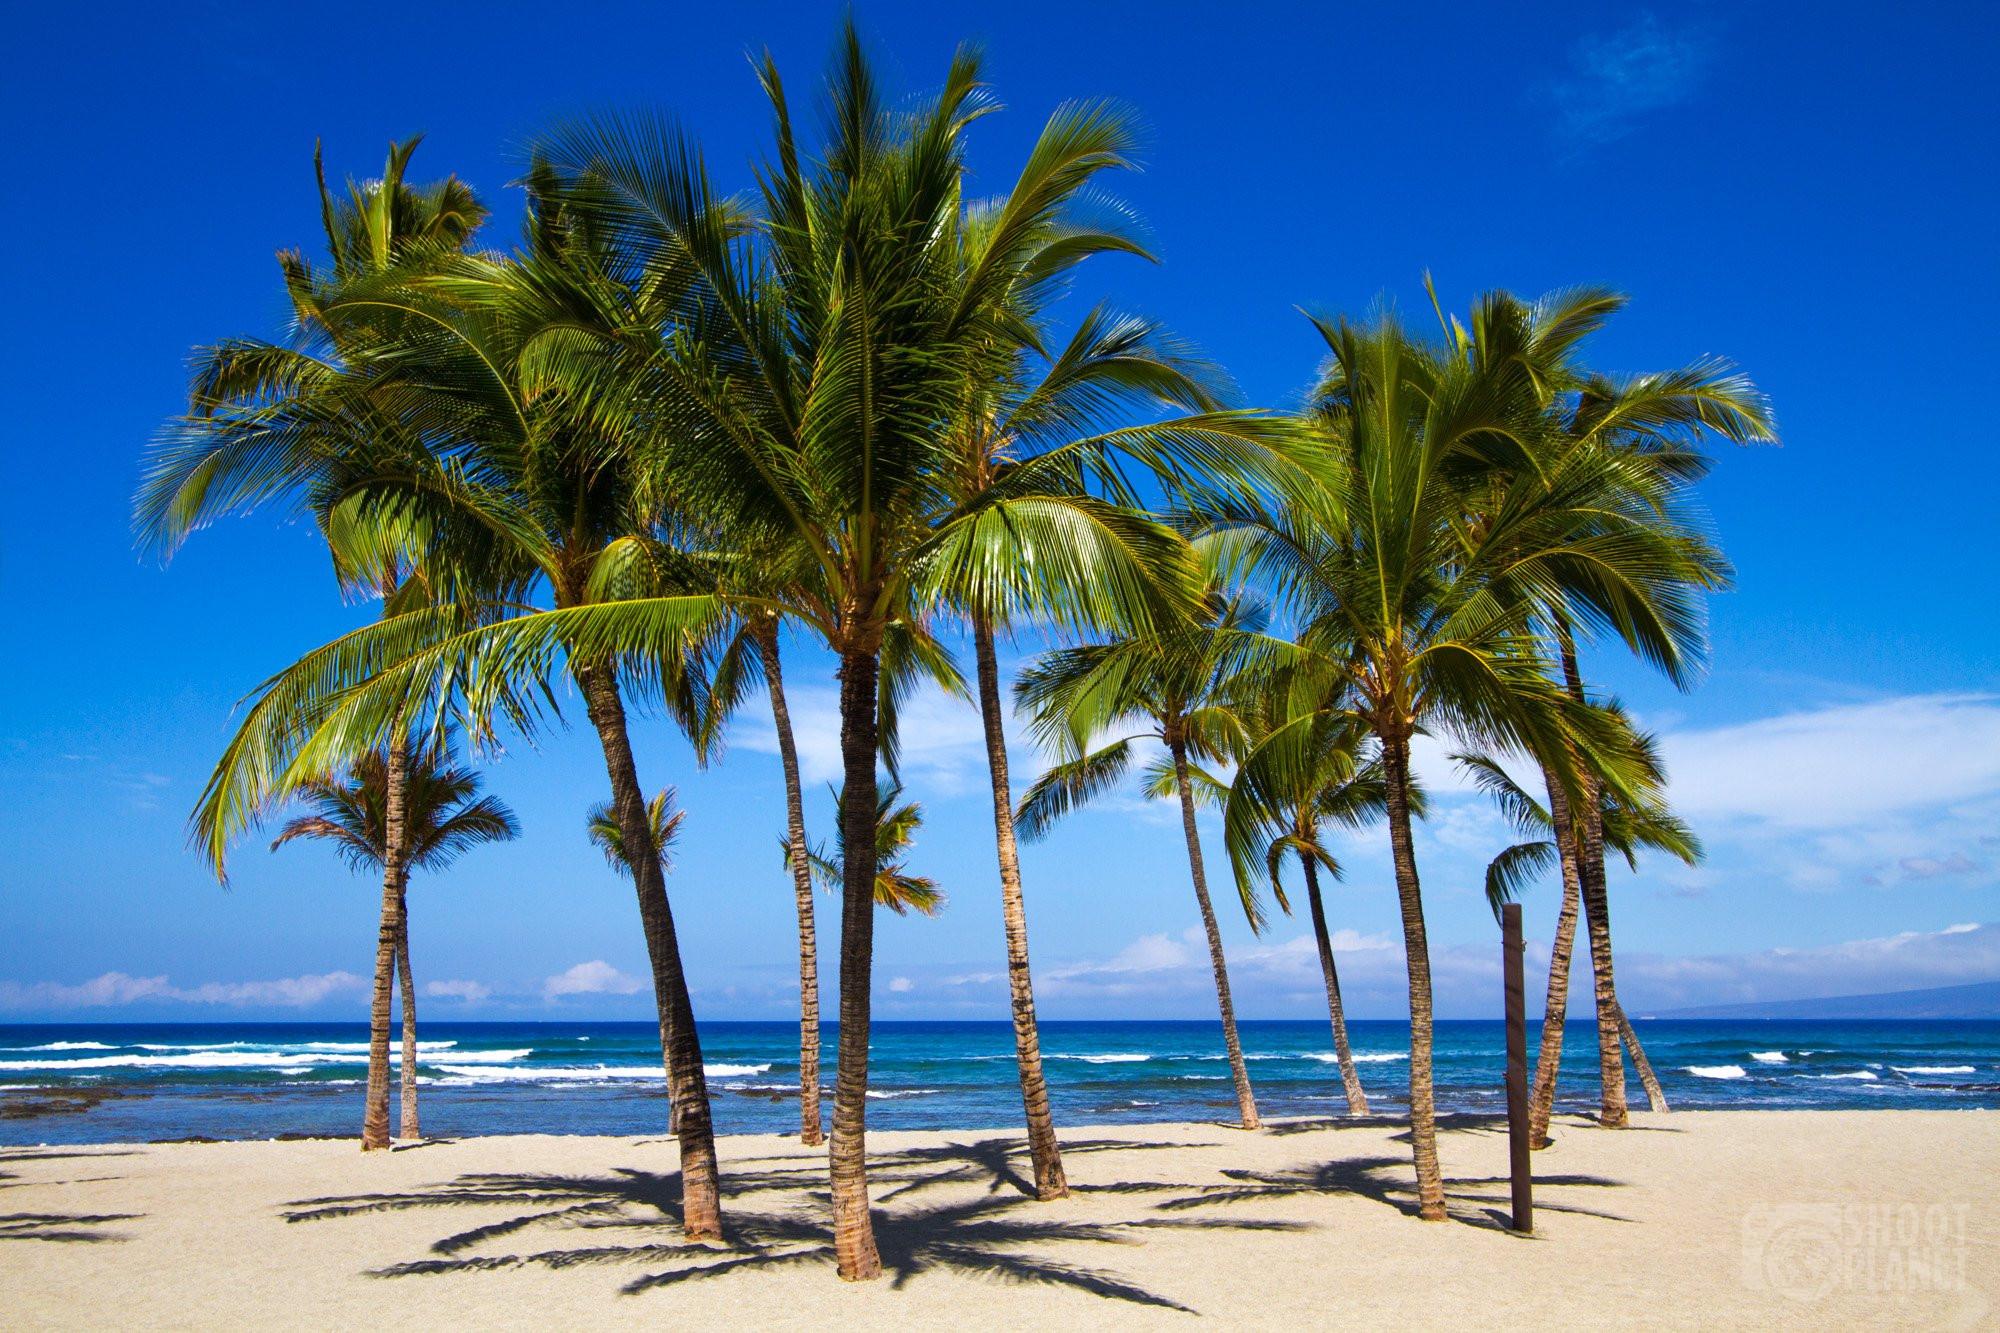 white sand beach and palm trees, Hawaii